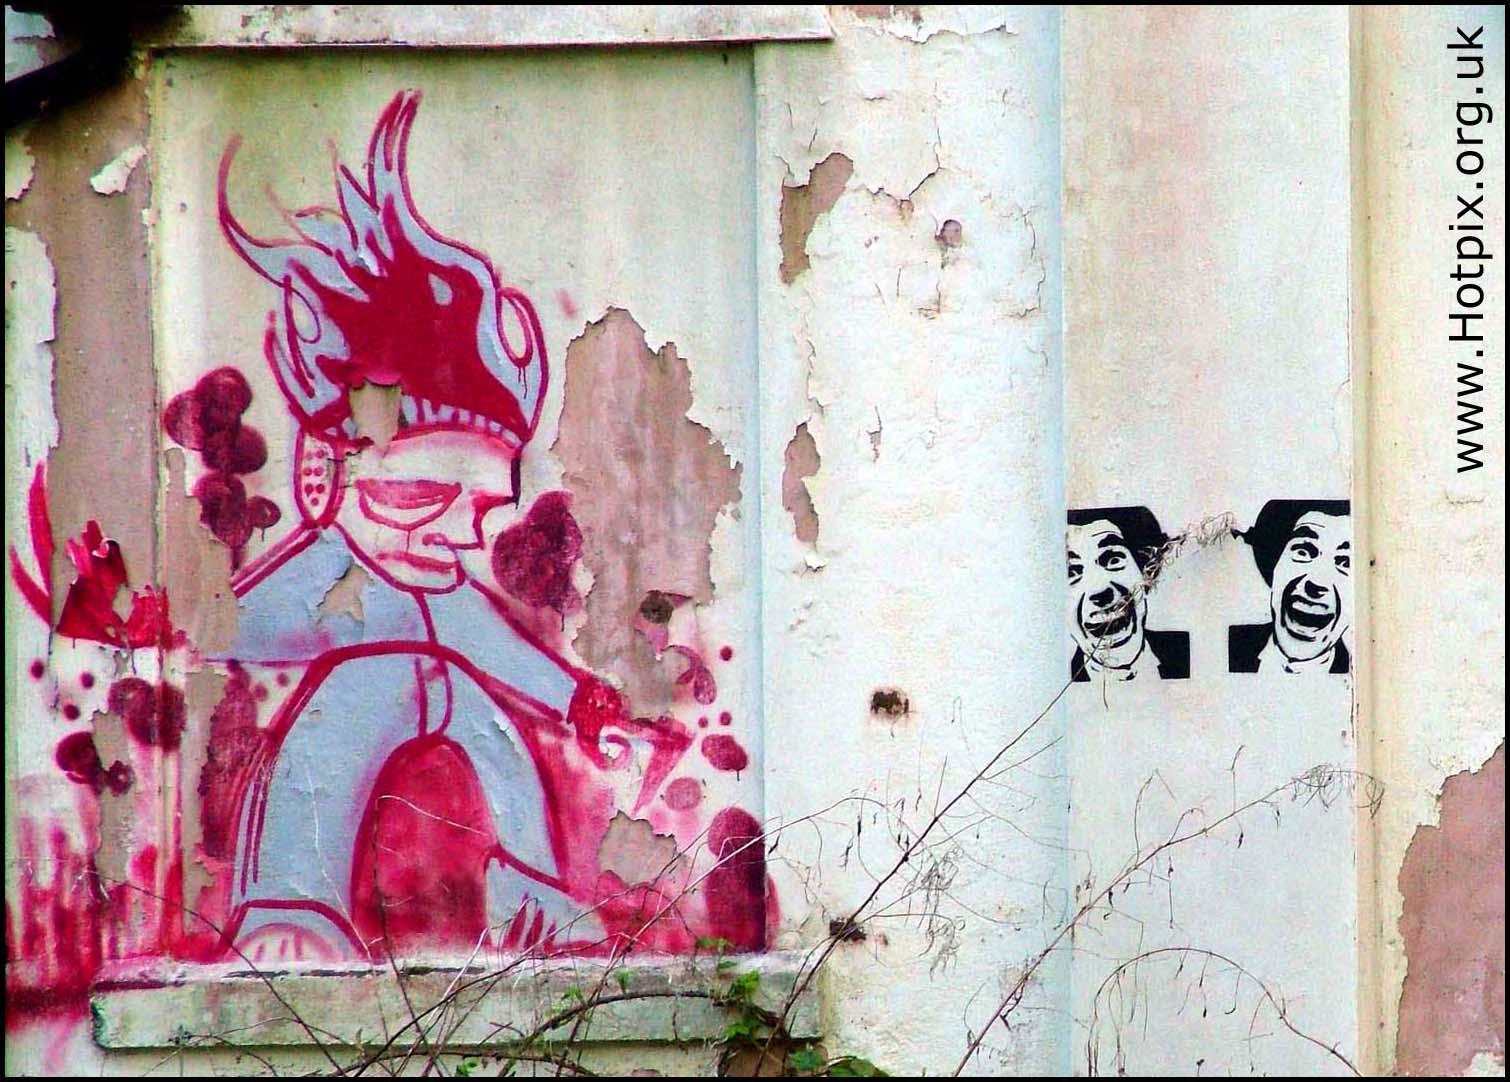 Lymm,Graffitti,Grafitti,Grafiti,Cheshire,tonysmith,tony,smith,tdktony,hotpix,hotpixuk,village,lymmvillage,england,UK,GB,A56,streetart,street,art,artist,tag,tagger,tagged,urban,banksy,banksi,graffito,stencil,asb,asbo,anti,social,vandelism,abstract